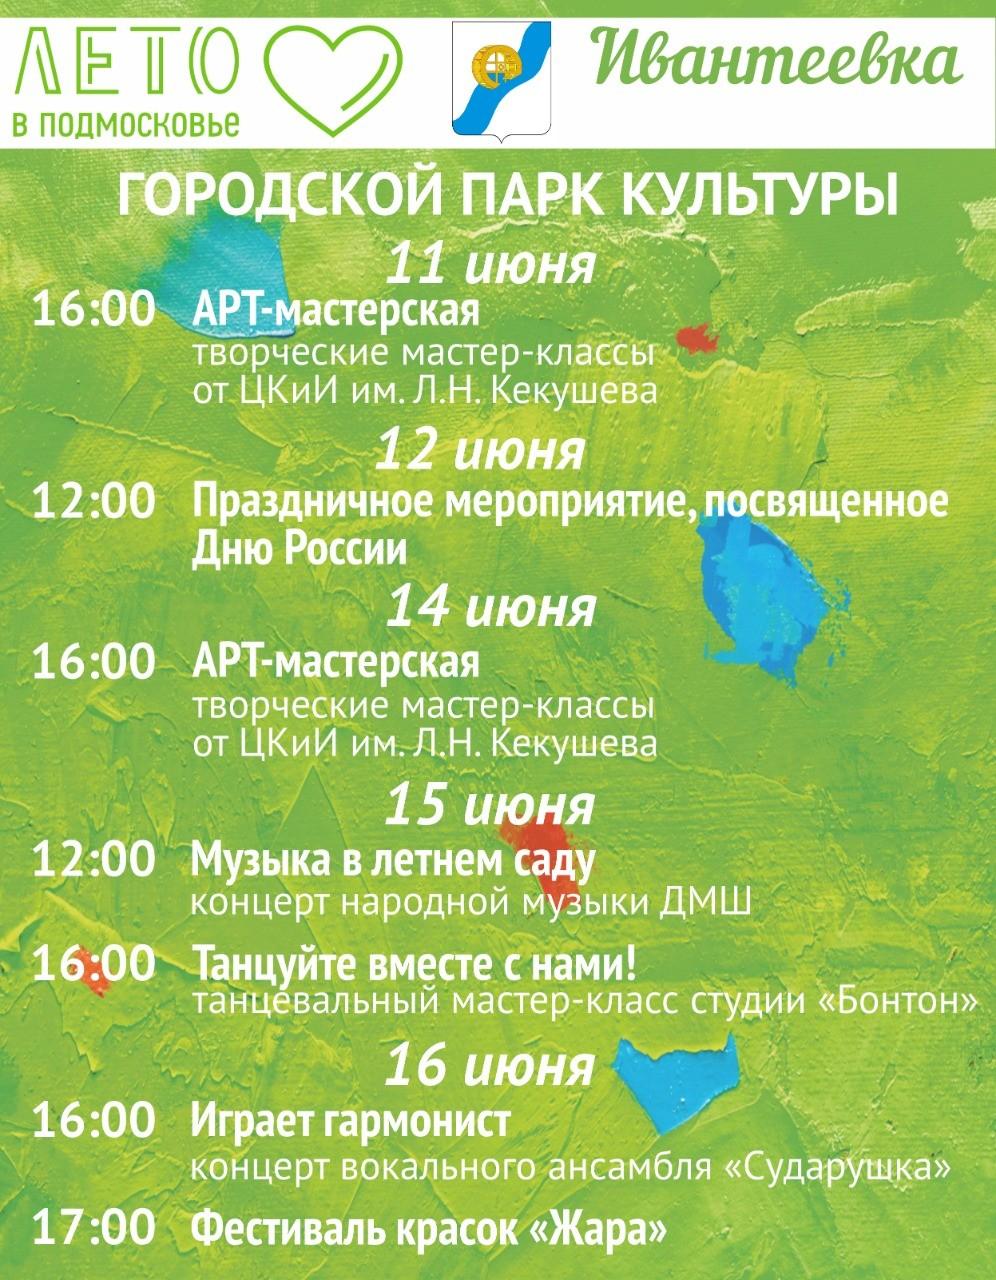 Афиша Ивантеевки с 11 по 16 июня